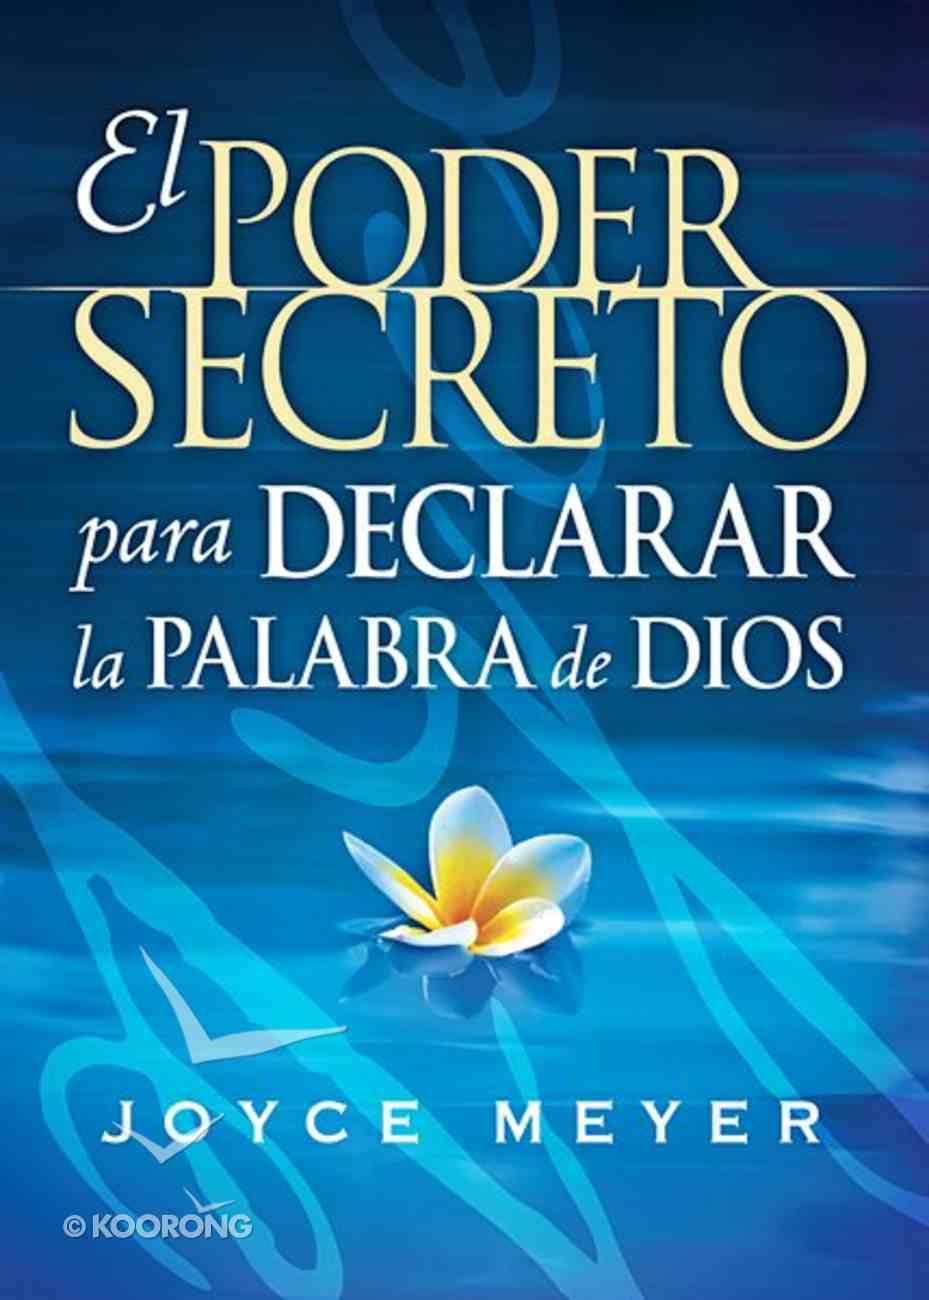 El Poder Secreto Para Hablar La Palabra De Dios (Secret Power Of Speaking God's Word) Paperback